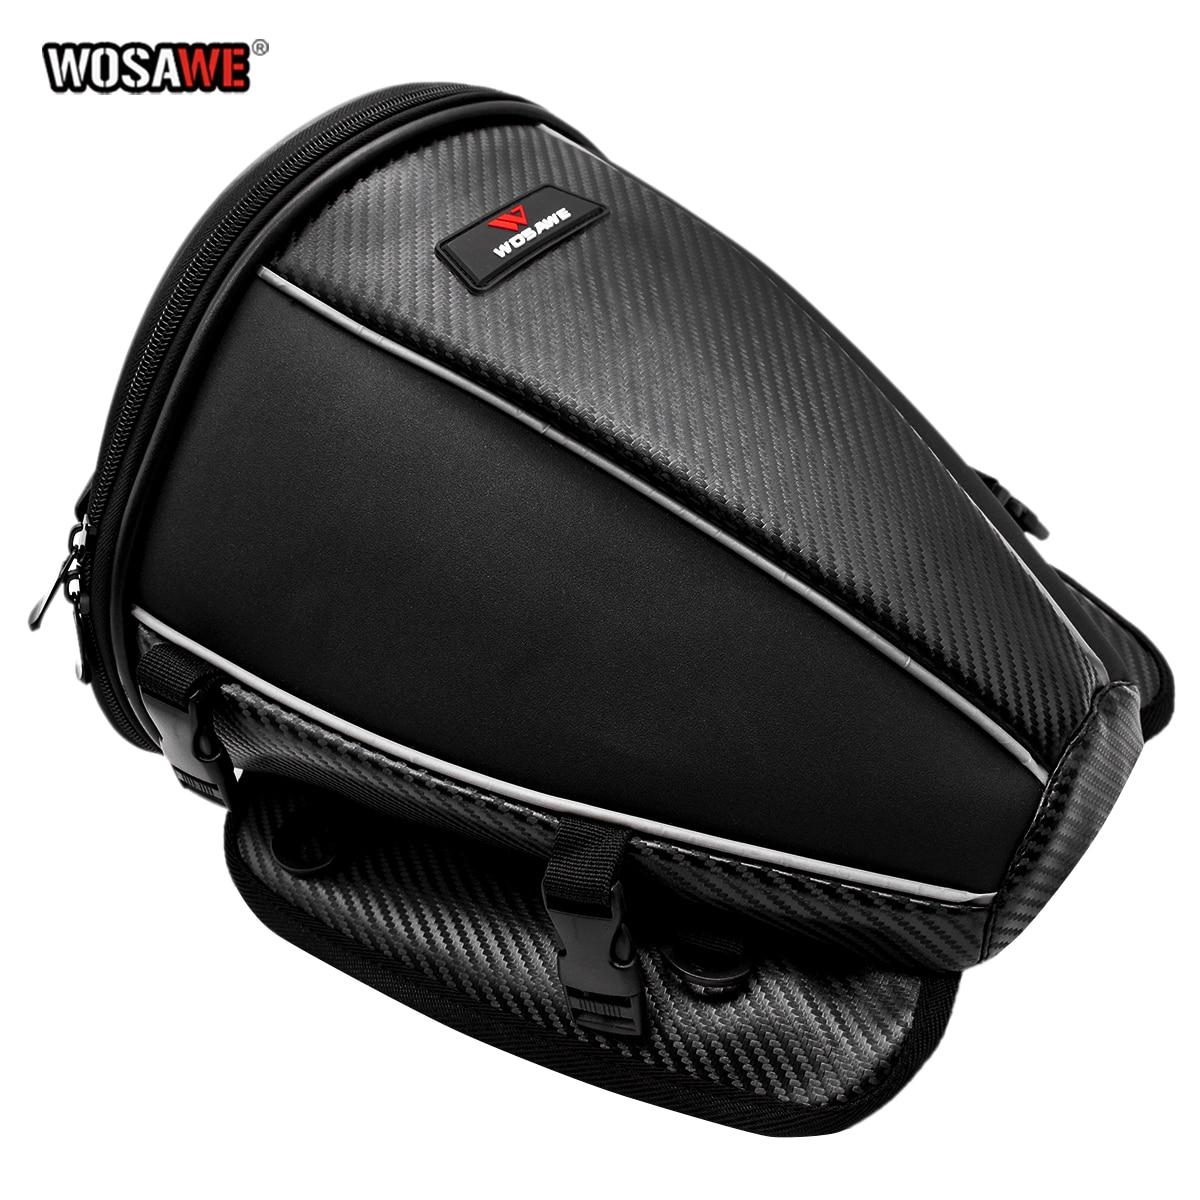 WOSAWE Waterproof Motorcycle Back Seat Bag Durable Reflective Rear Motorcycle Rider Backpacks Luggage saddle Bag 16L